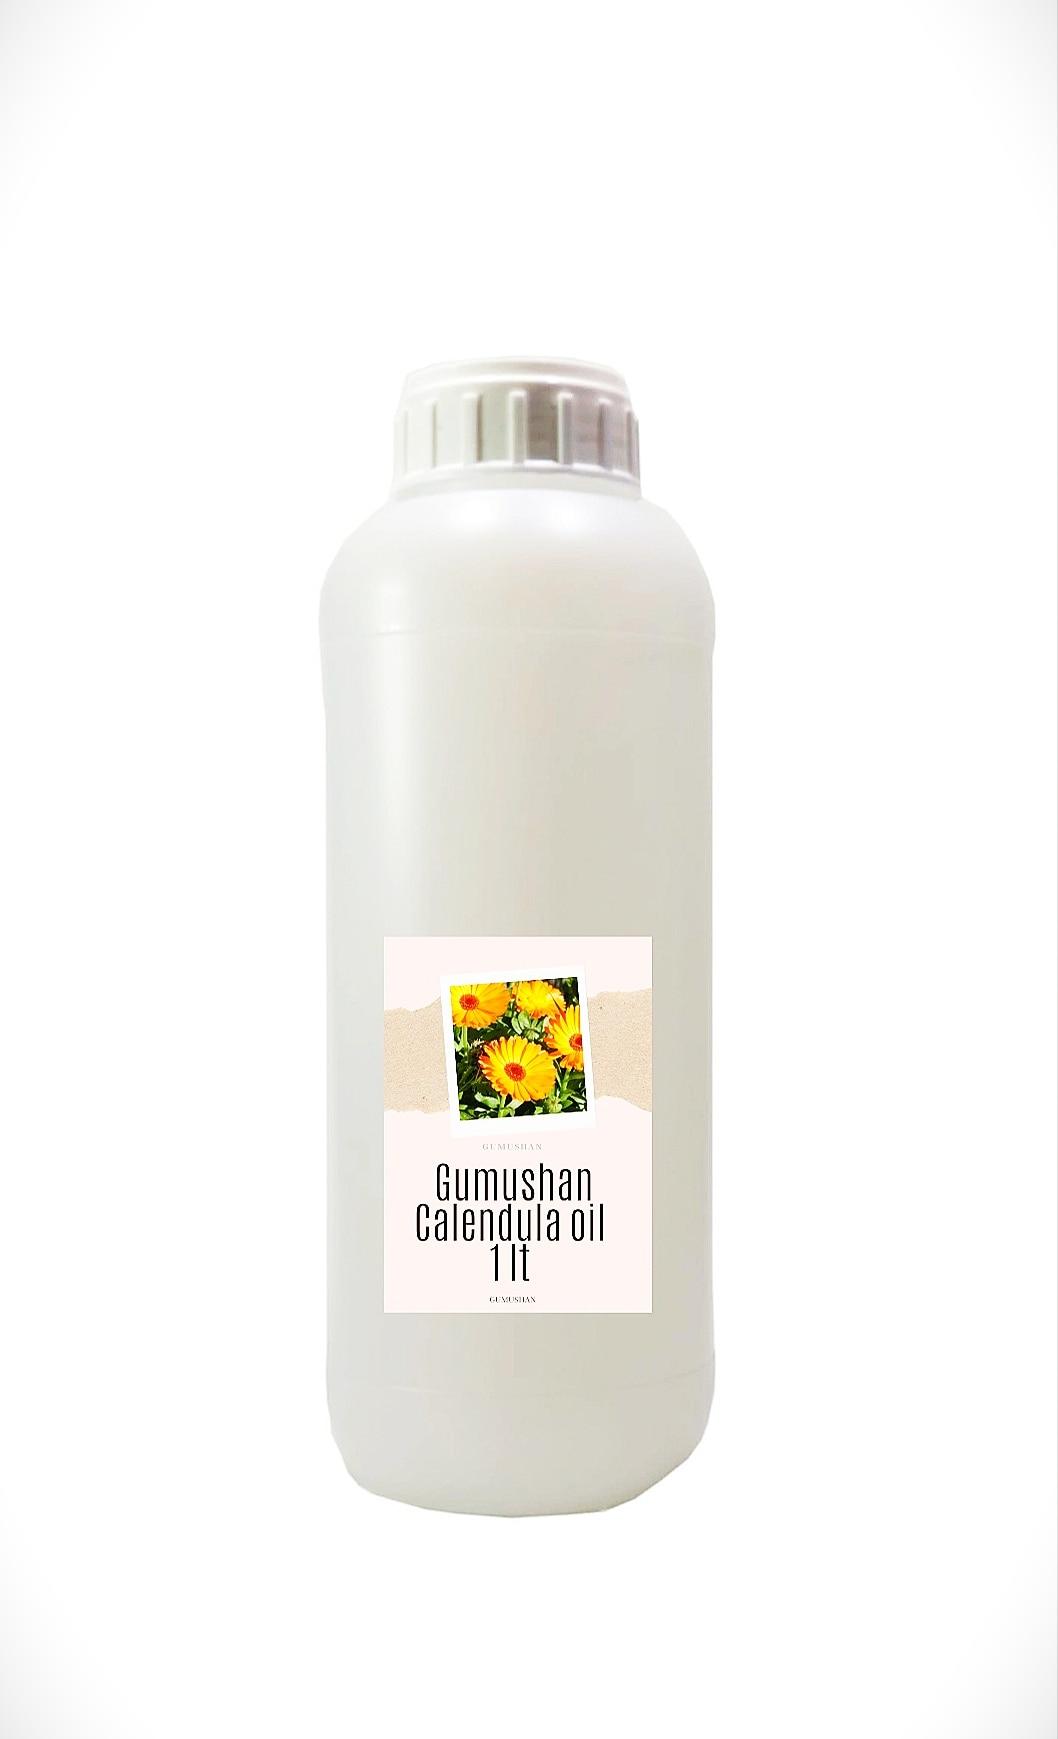 High quality pure Calendula Oil 1 liter 34 fl oz 1000ml